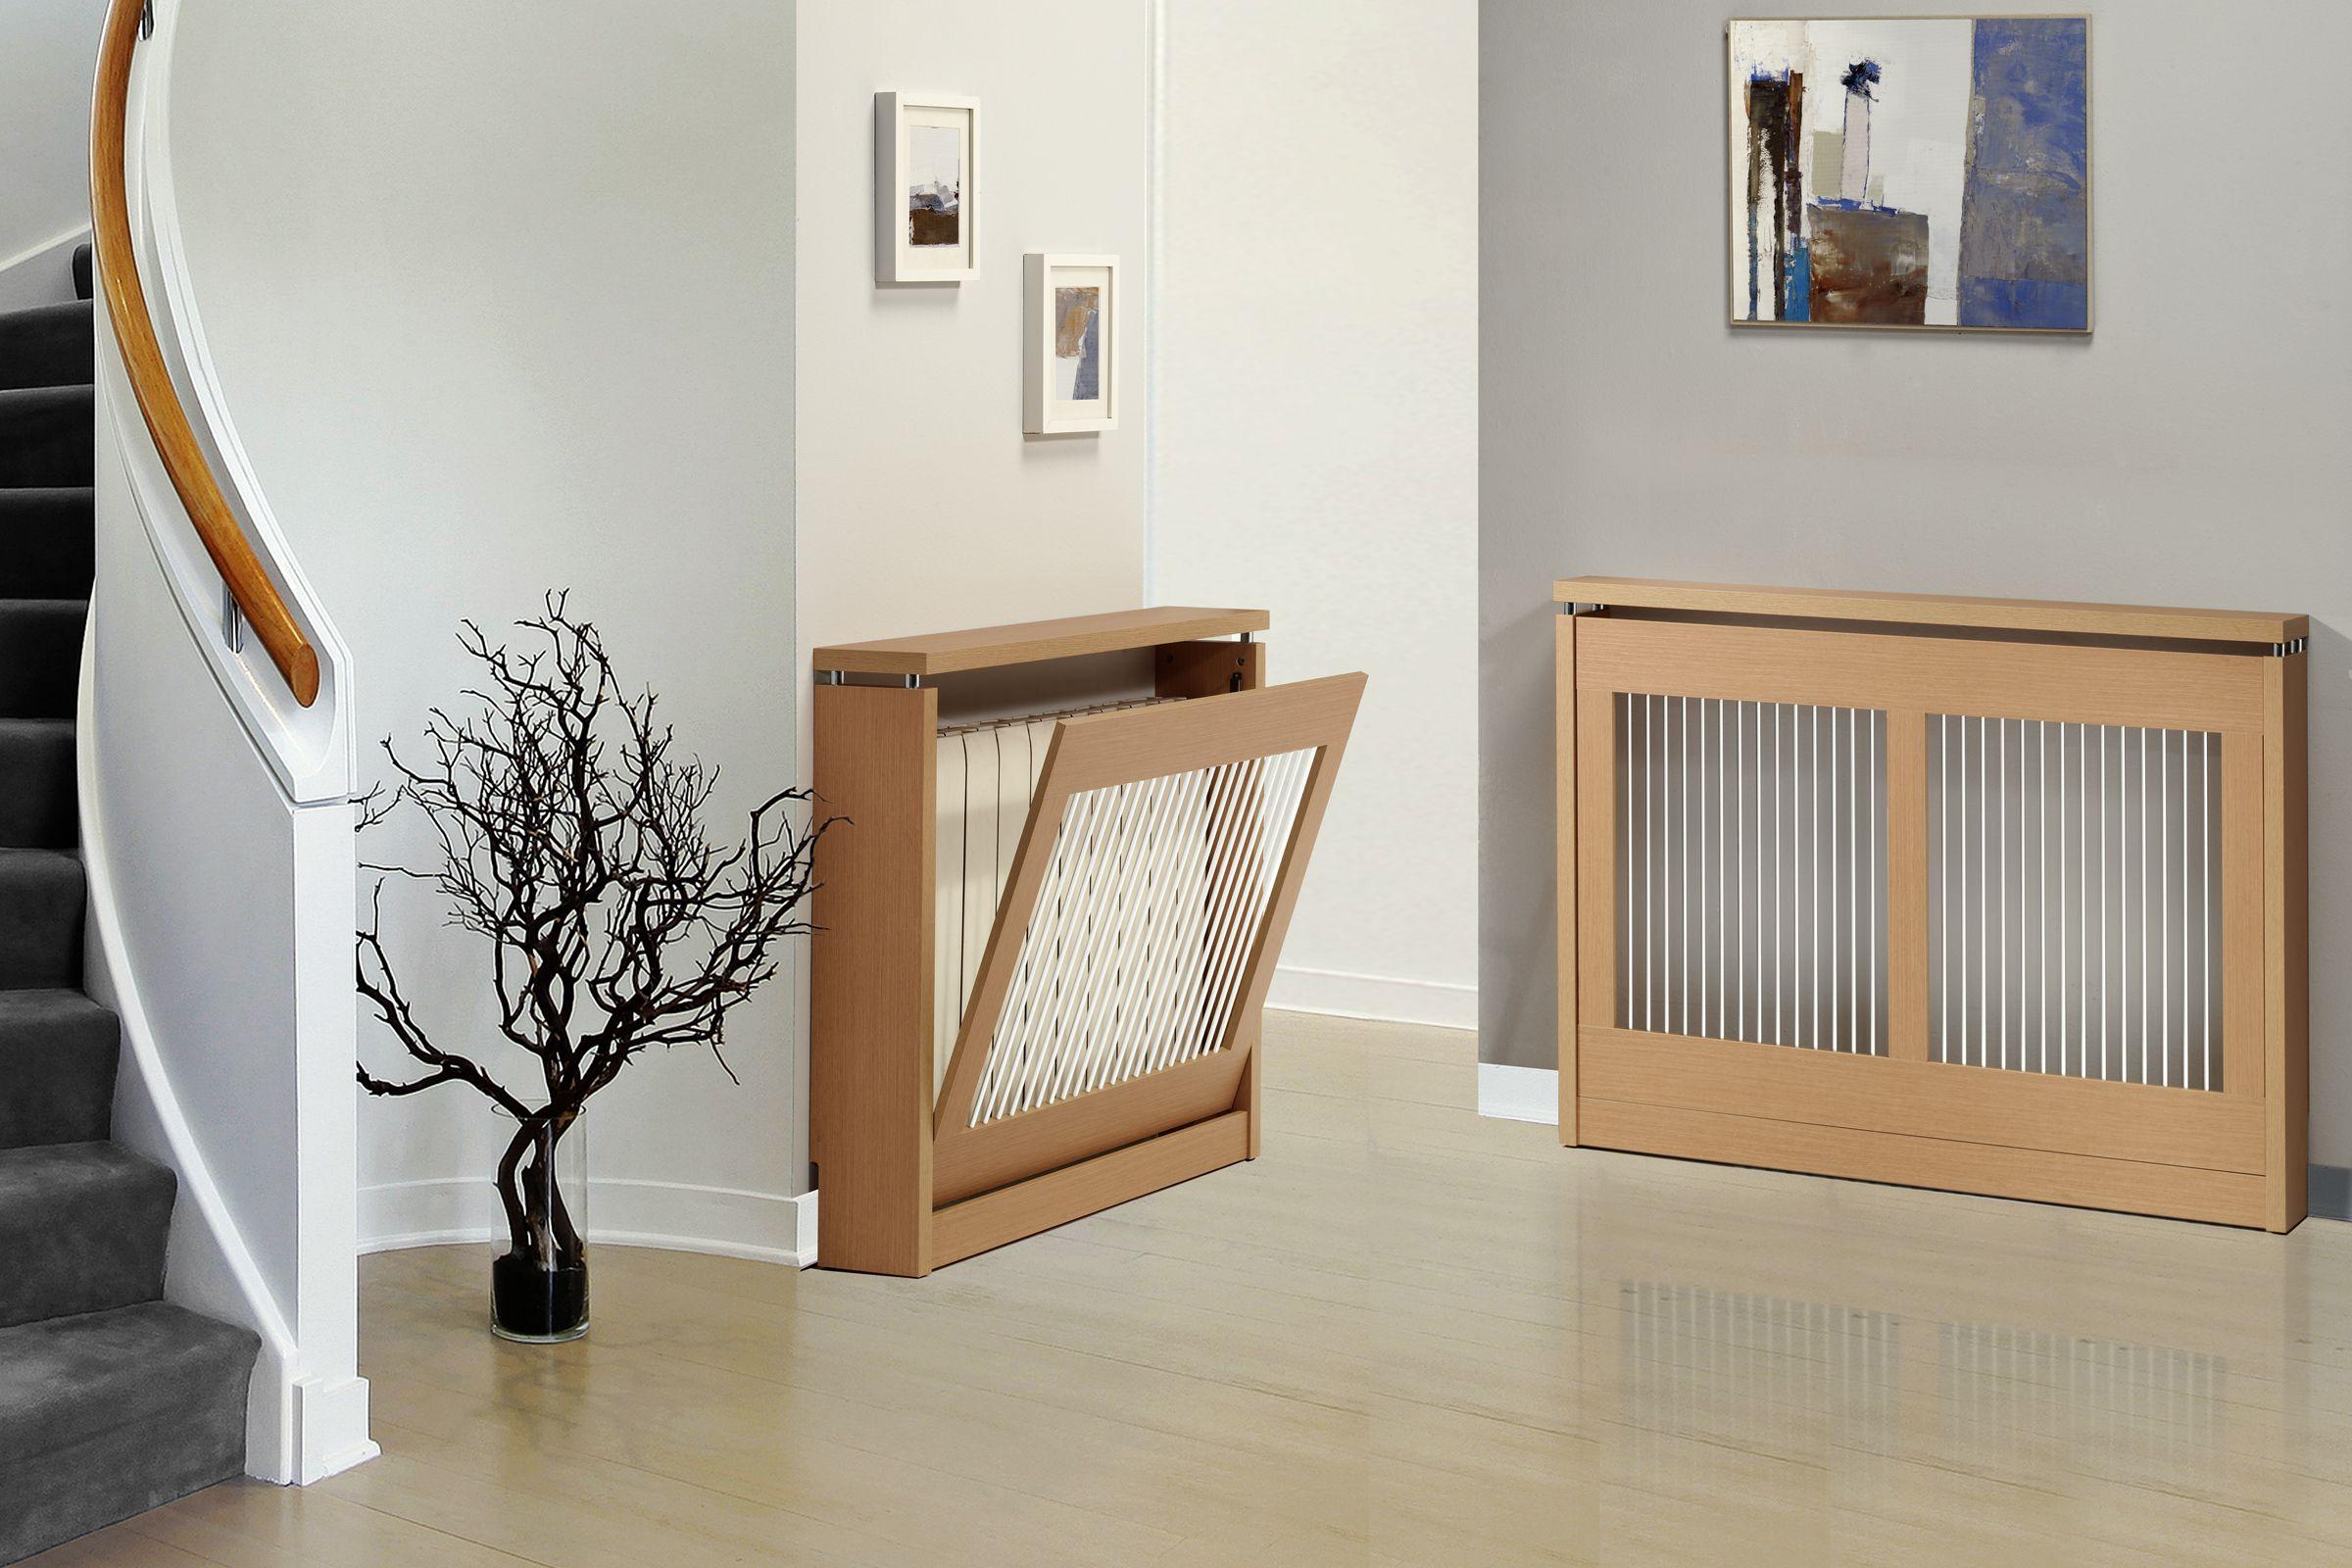 cubreradiador-hogar-decorativo-roble